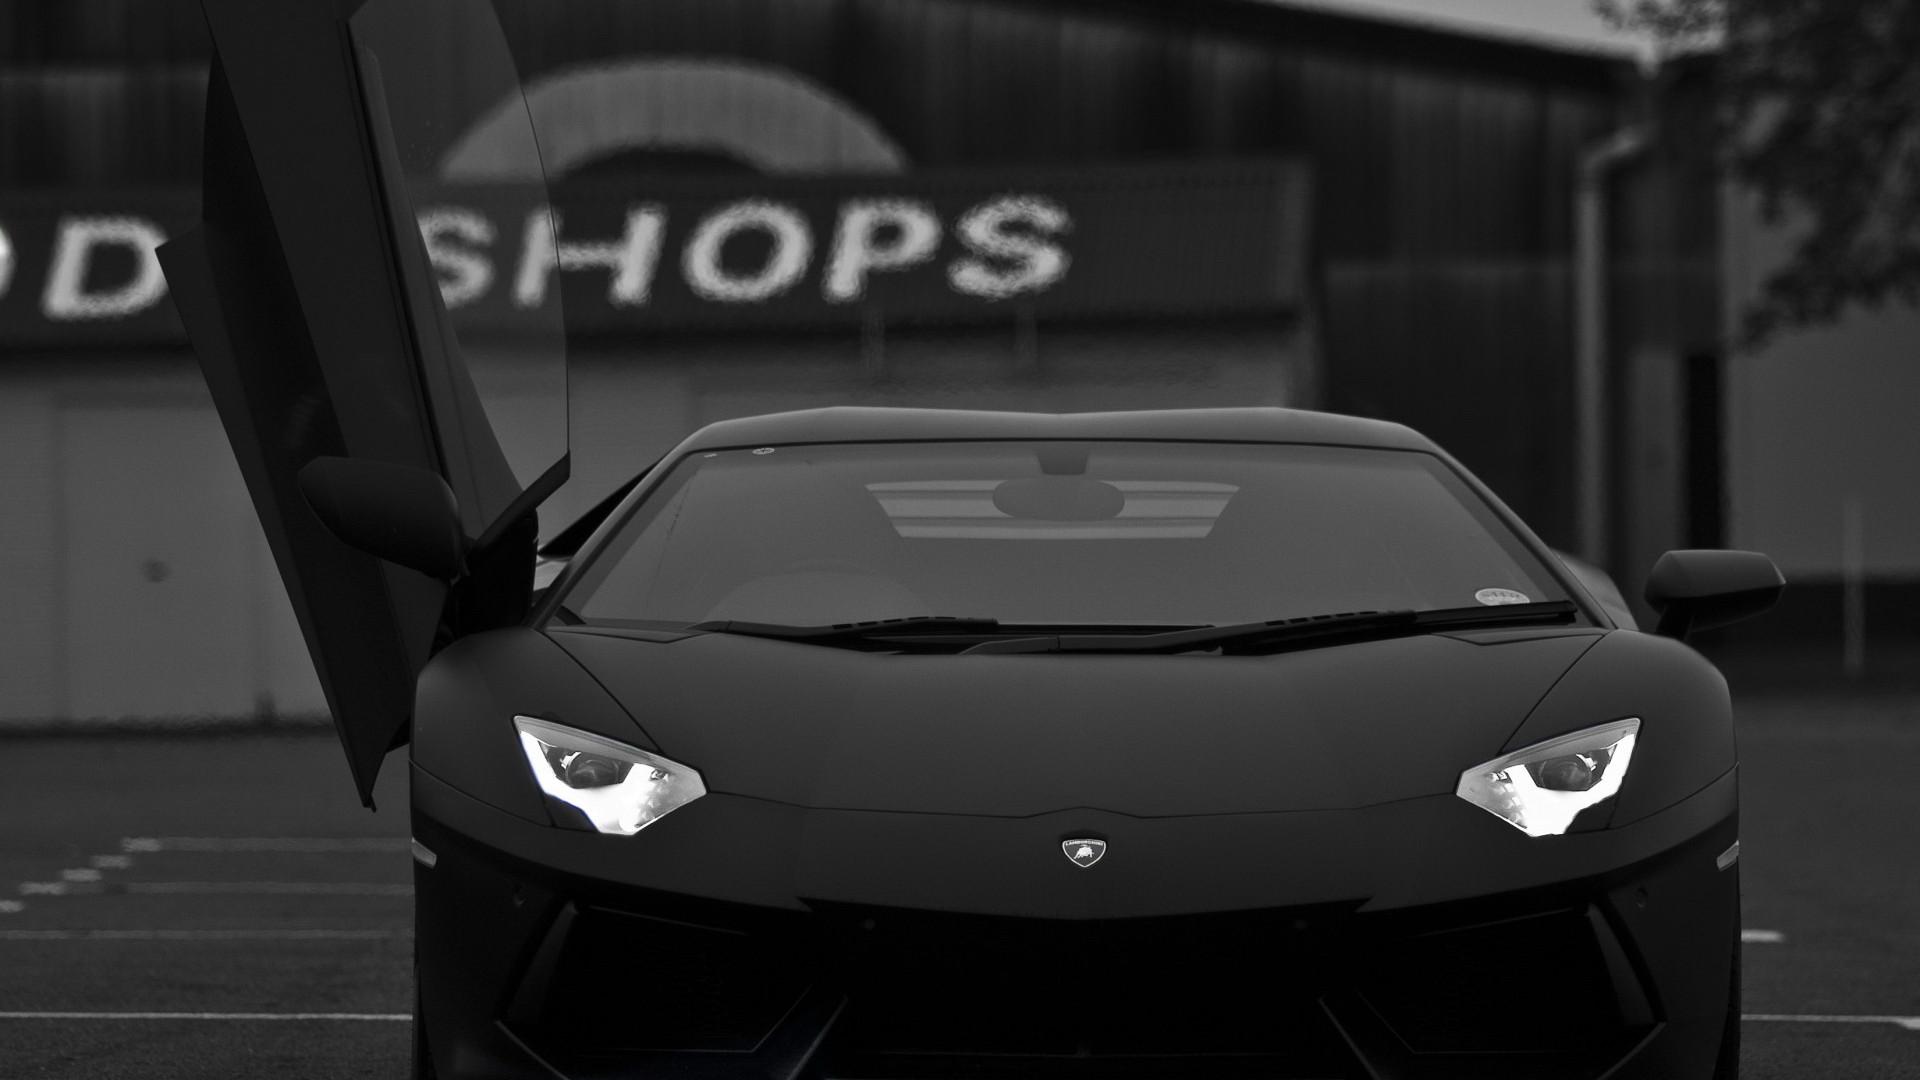 Lamborghini Reventon Wallpaper 2018 (61+ images)